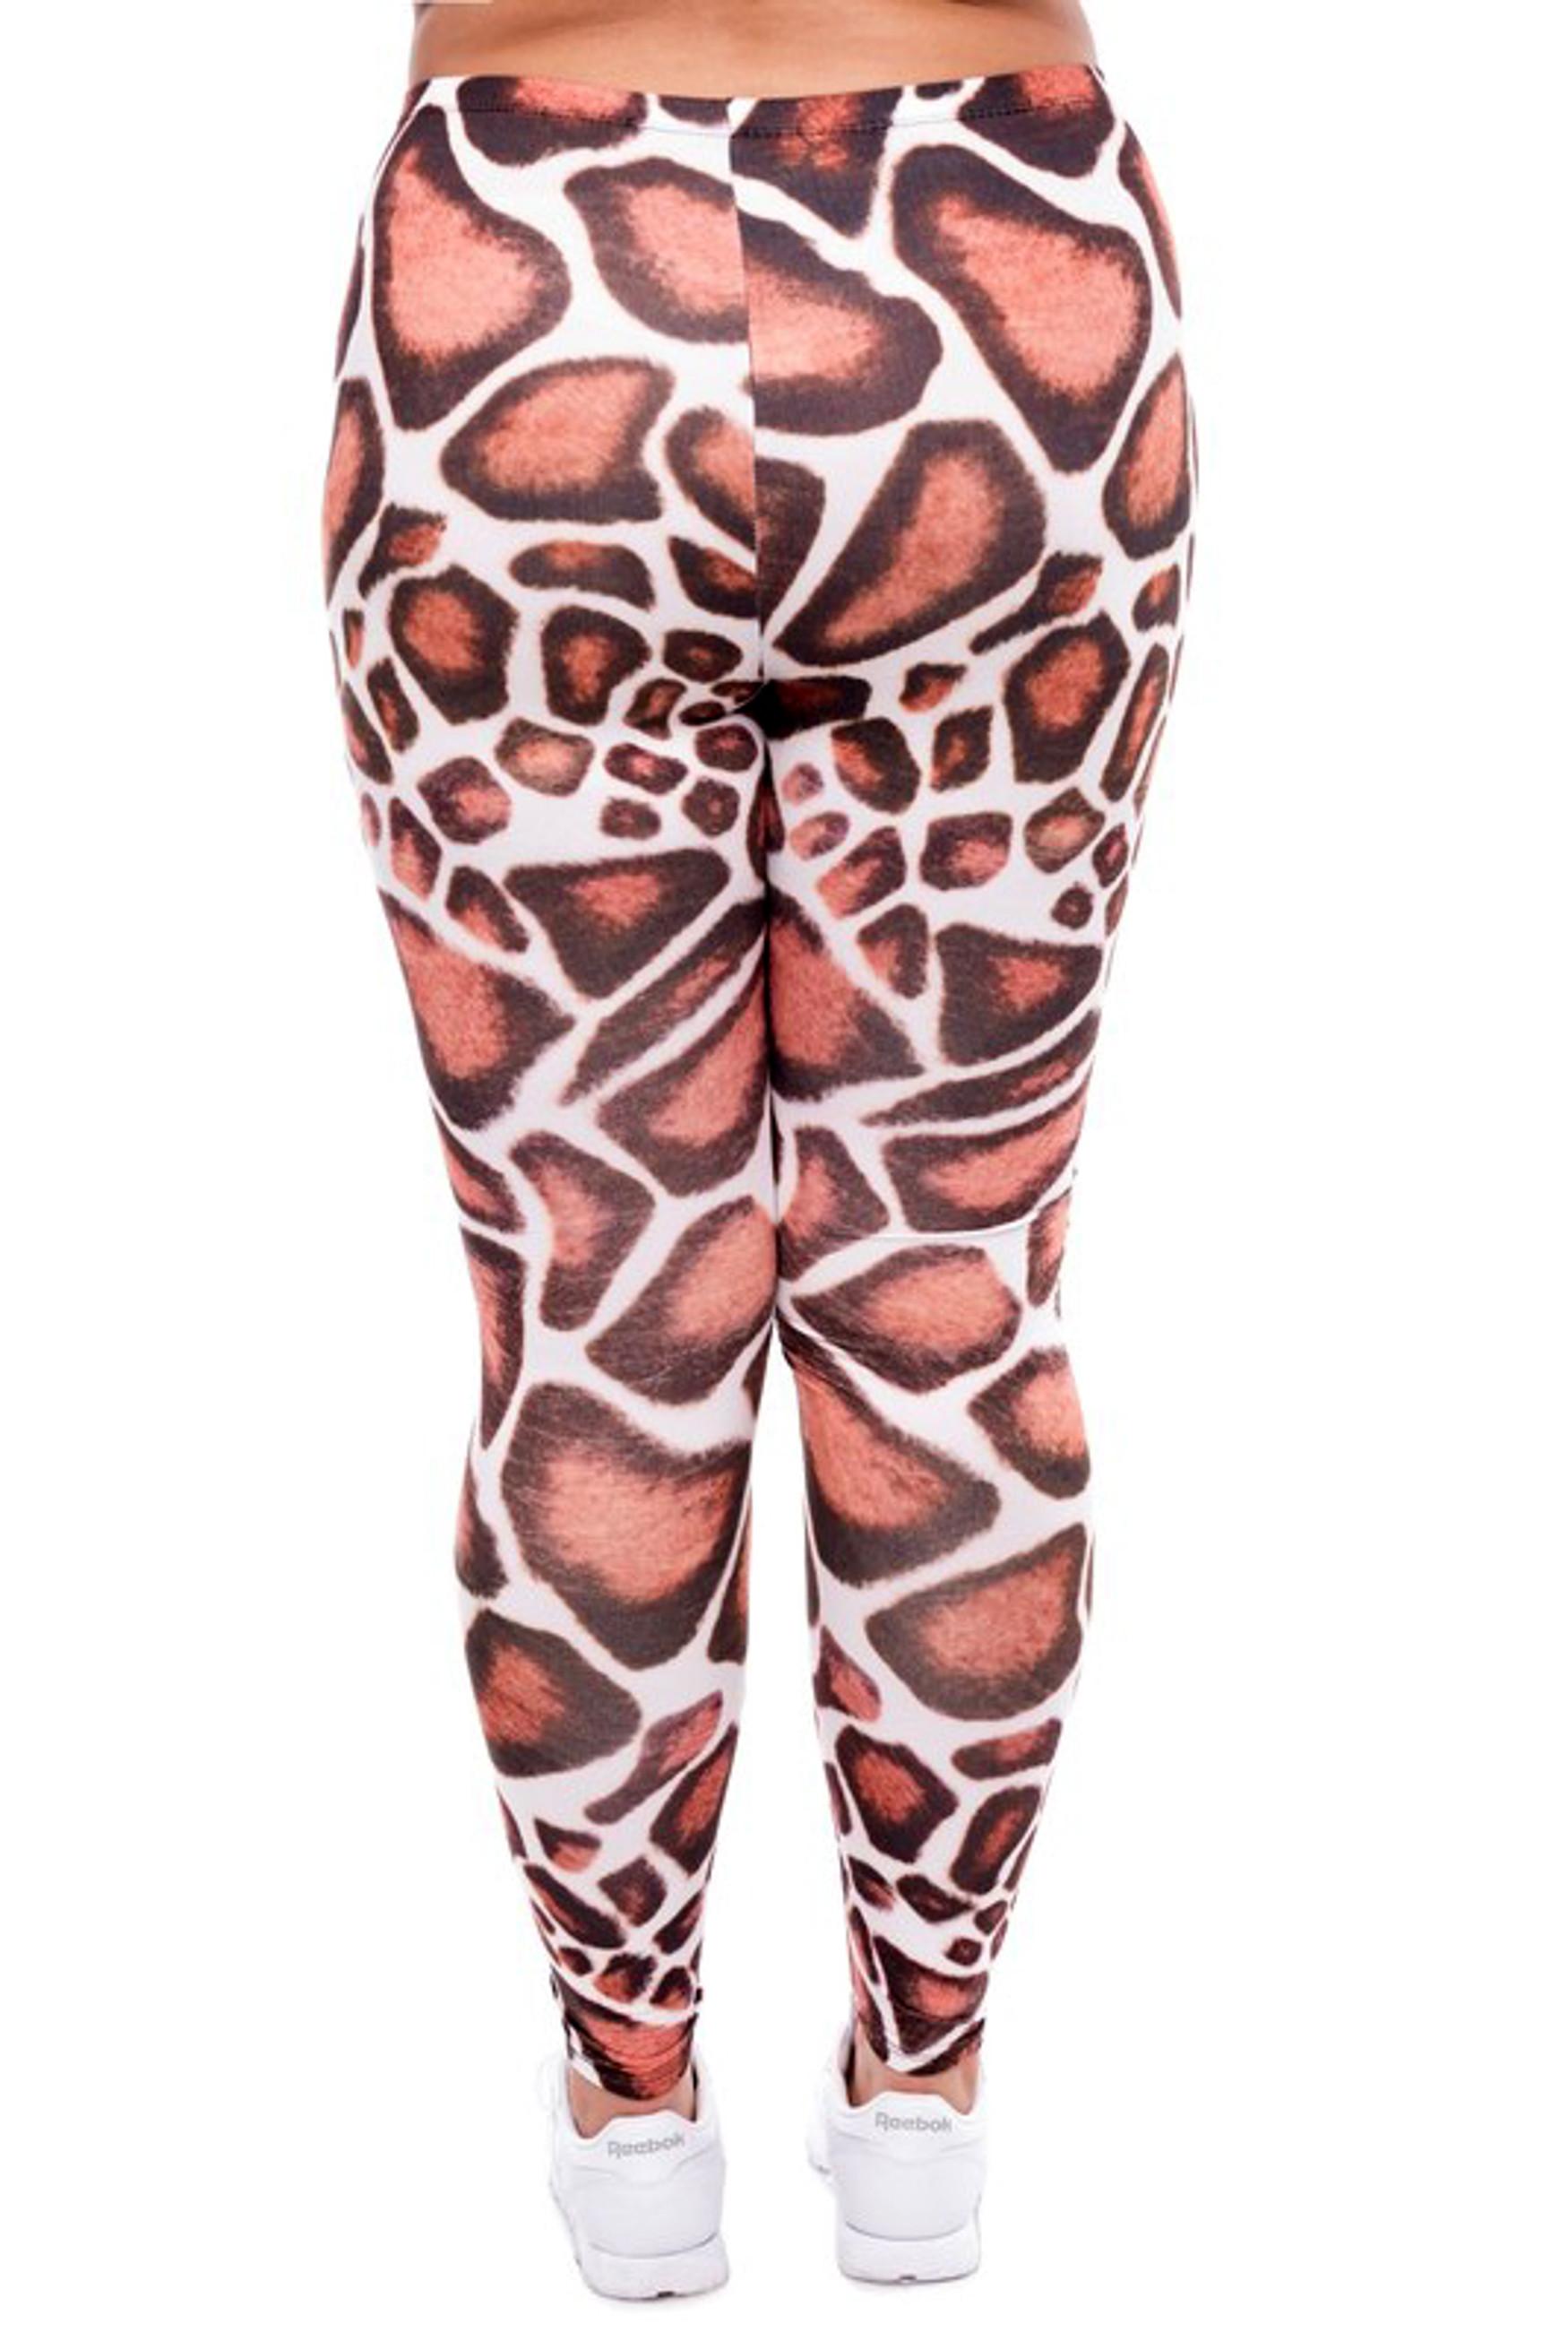 Giraffe Print Leggings - Plus Size